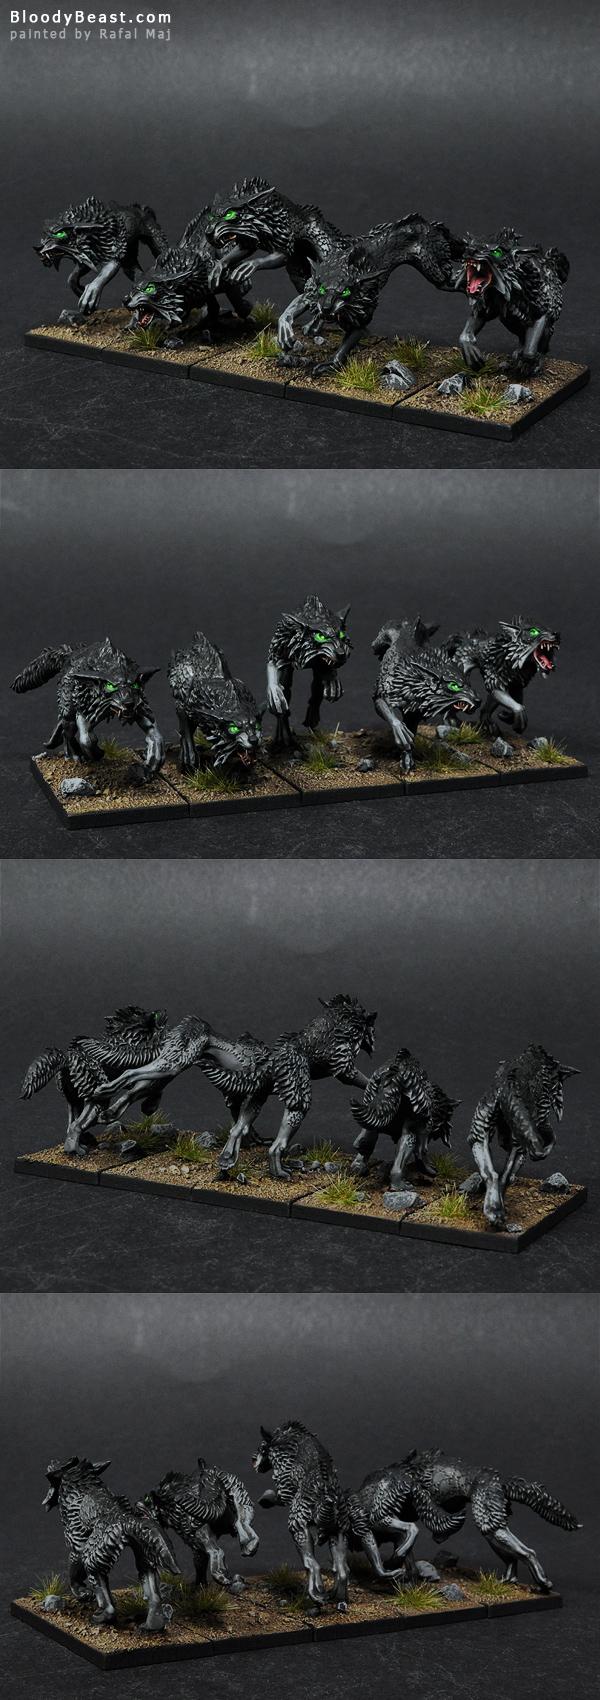 Black Wolves painted by Rafal Maj (BloodyBeast.com)